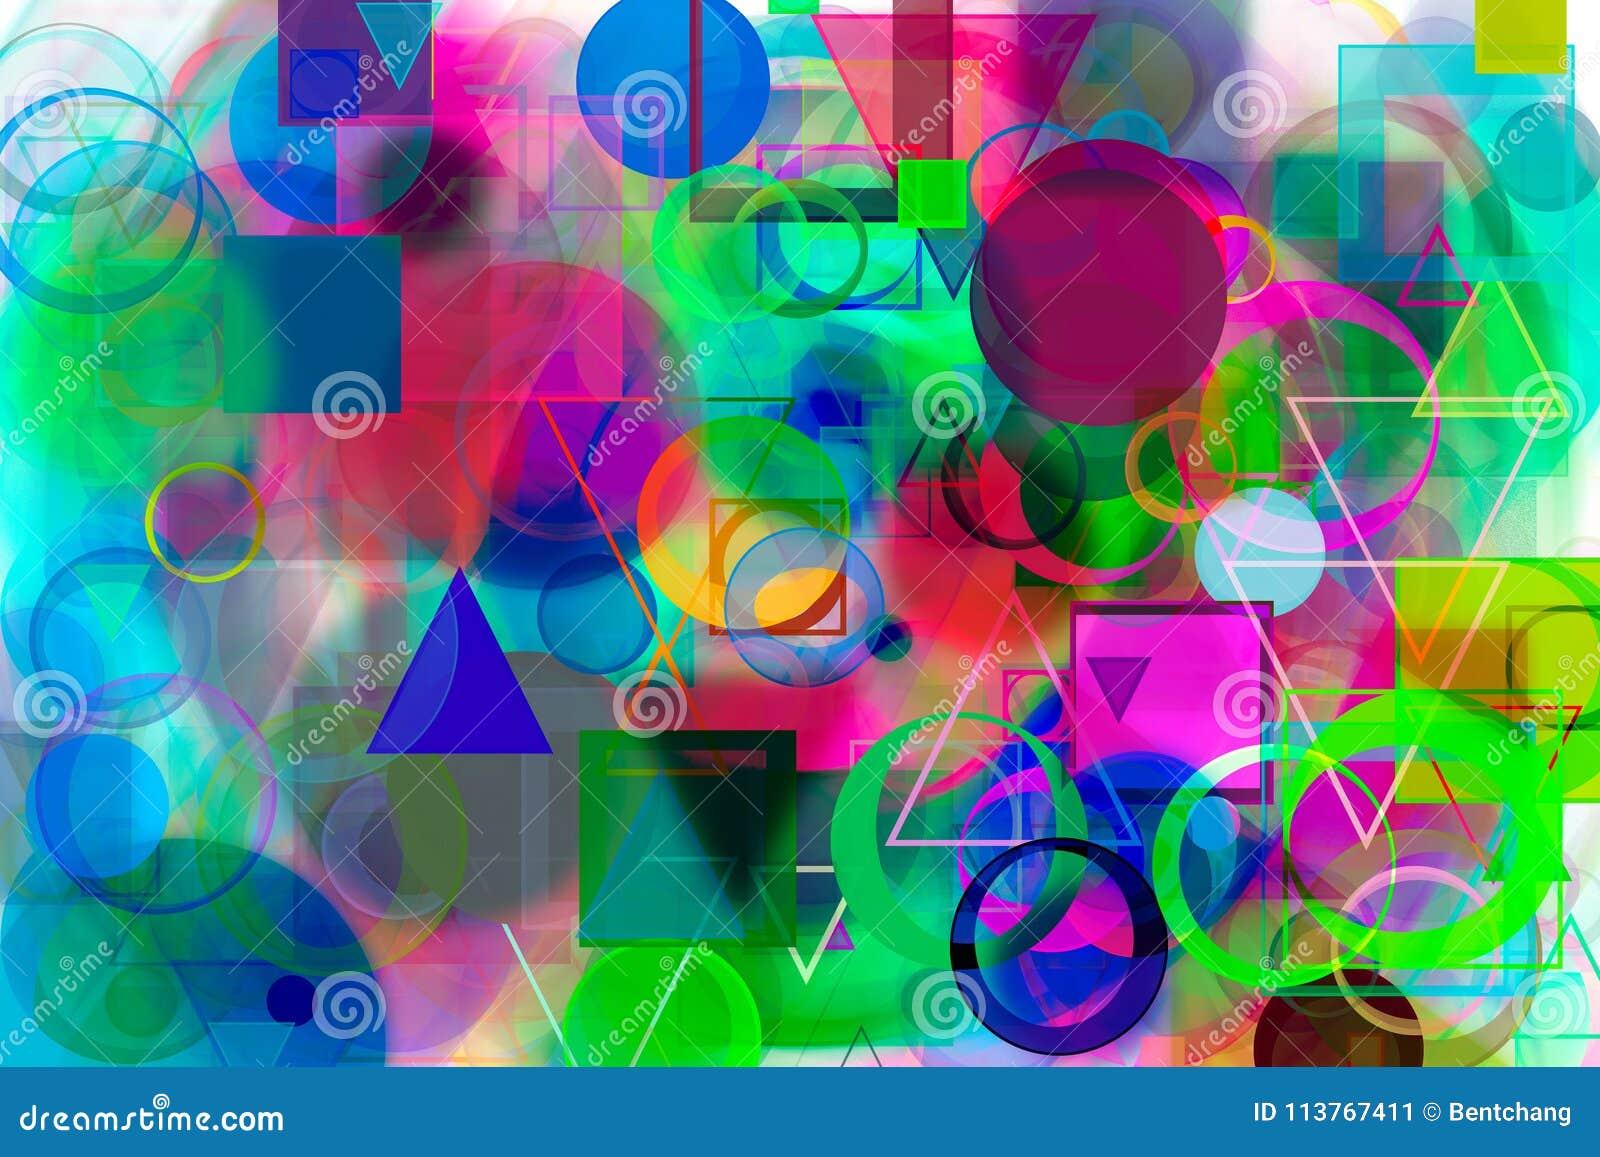 Abstract Shape Generative Design Art Background Pattern